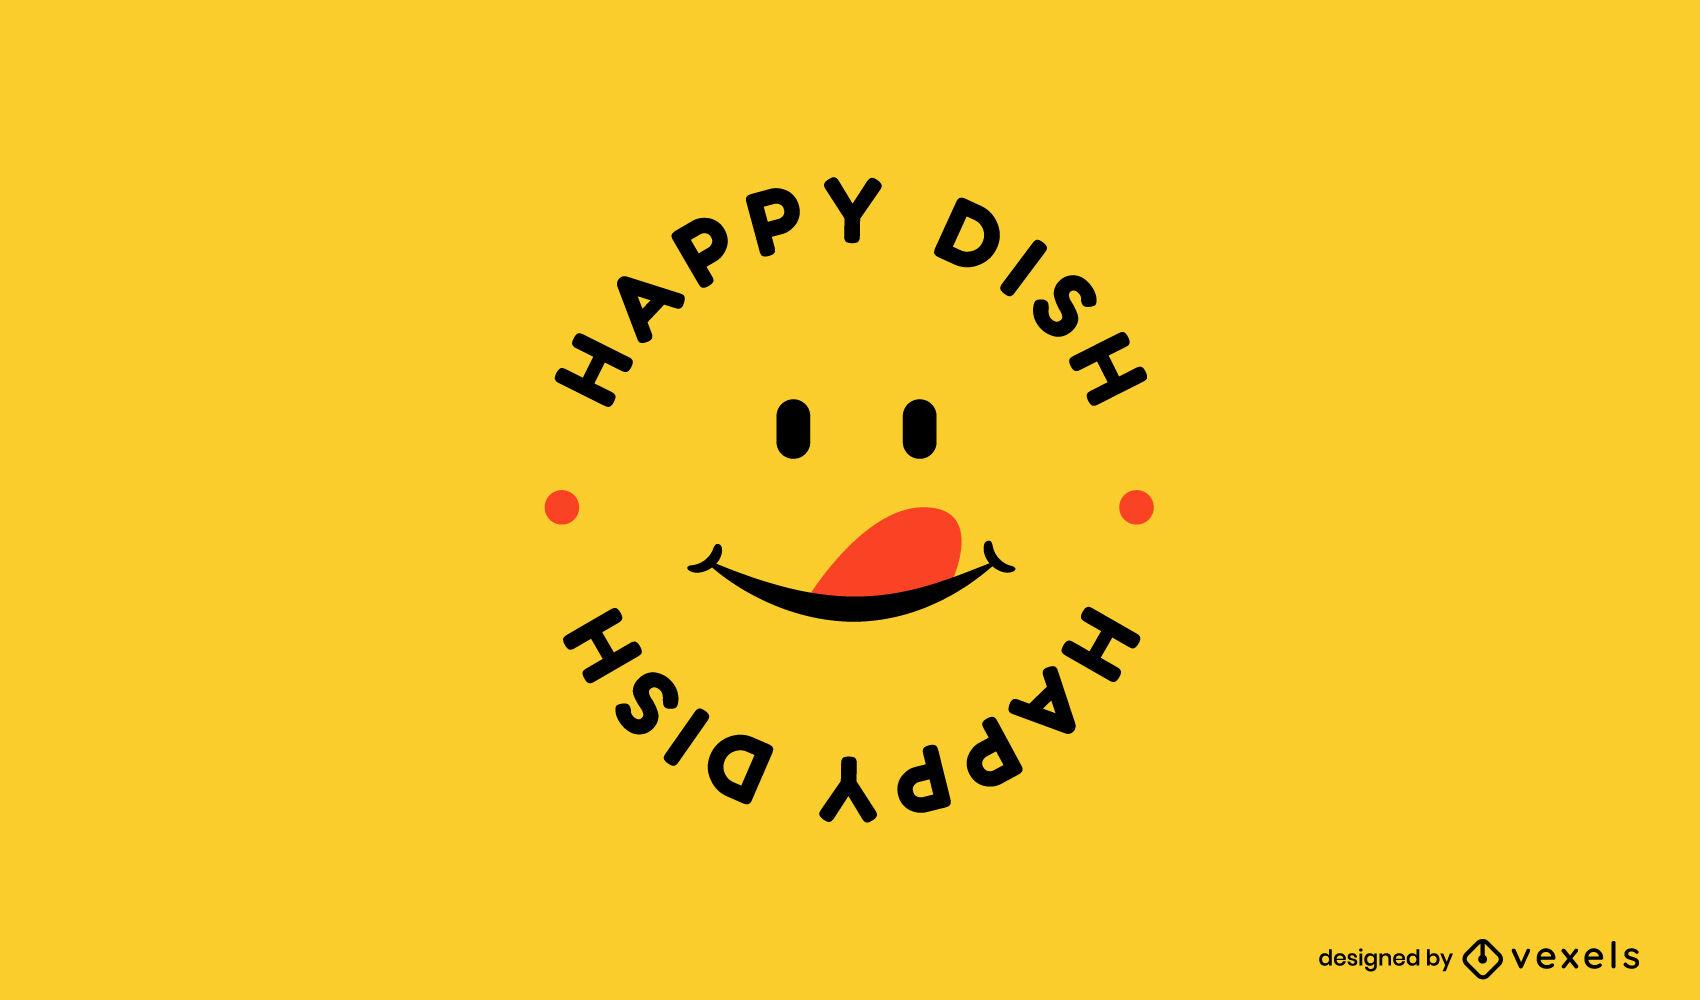 Happy face emoji business logo template